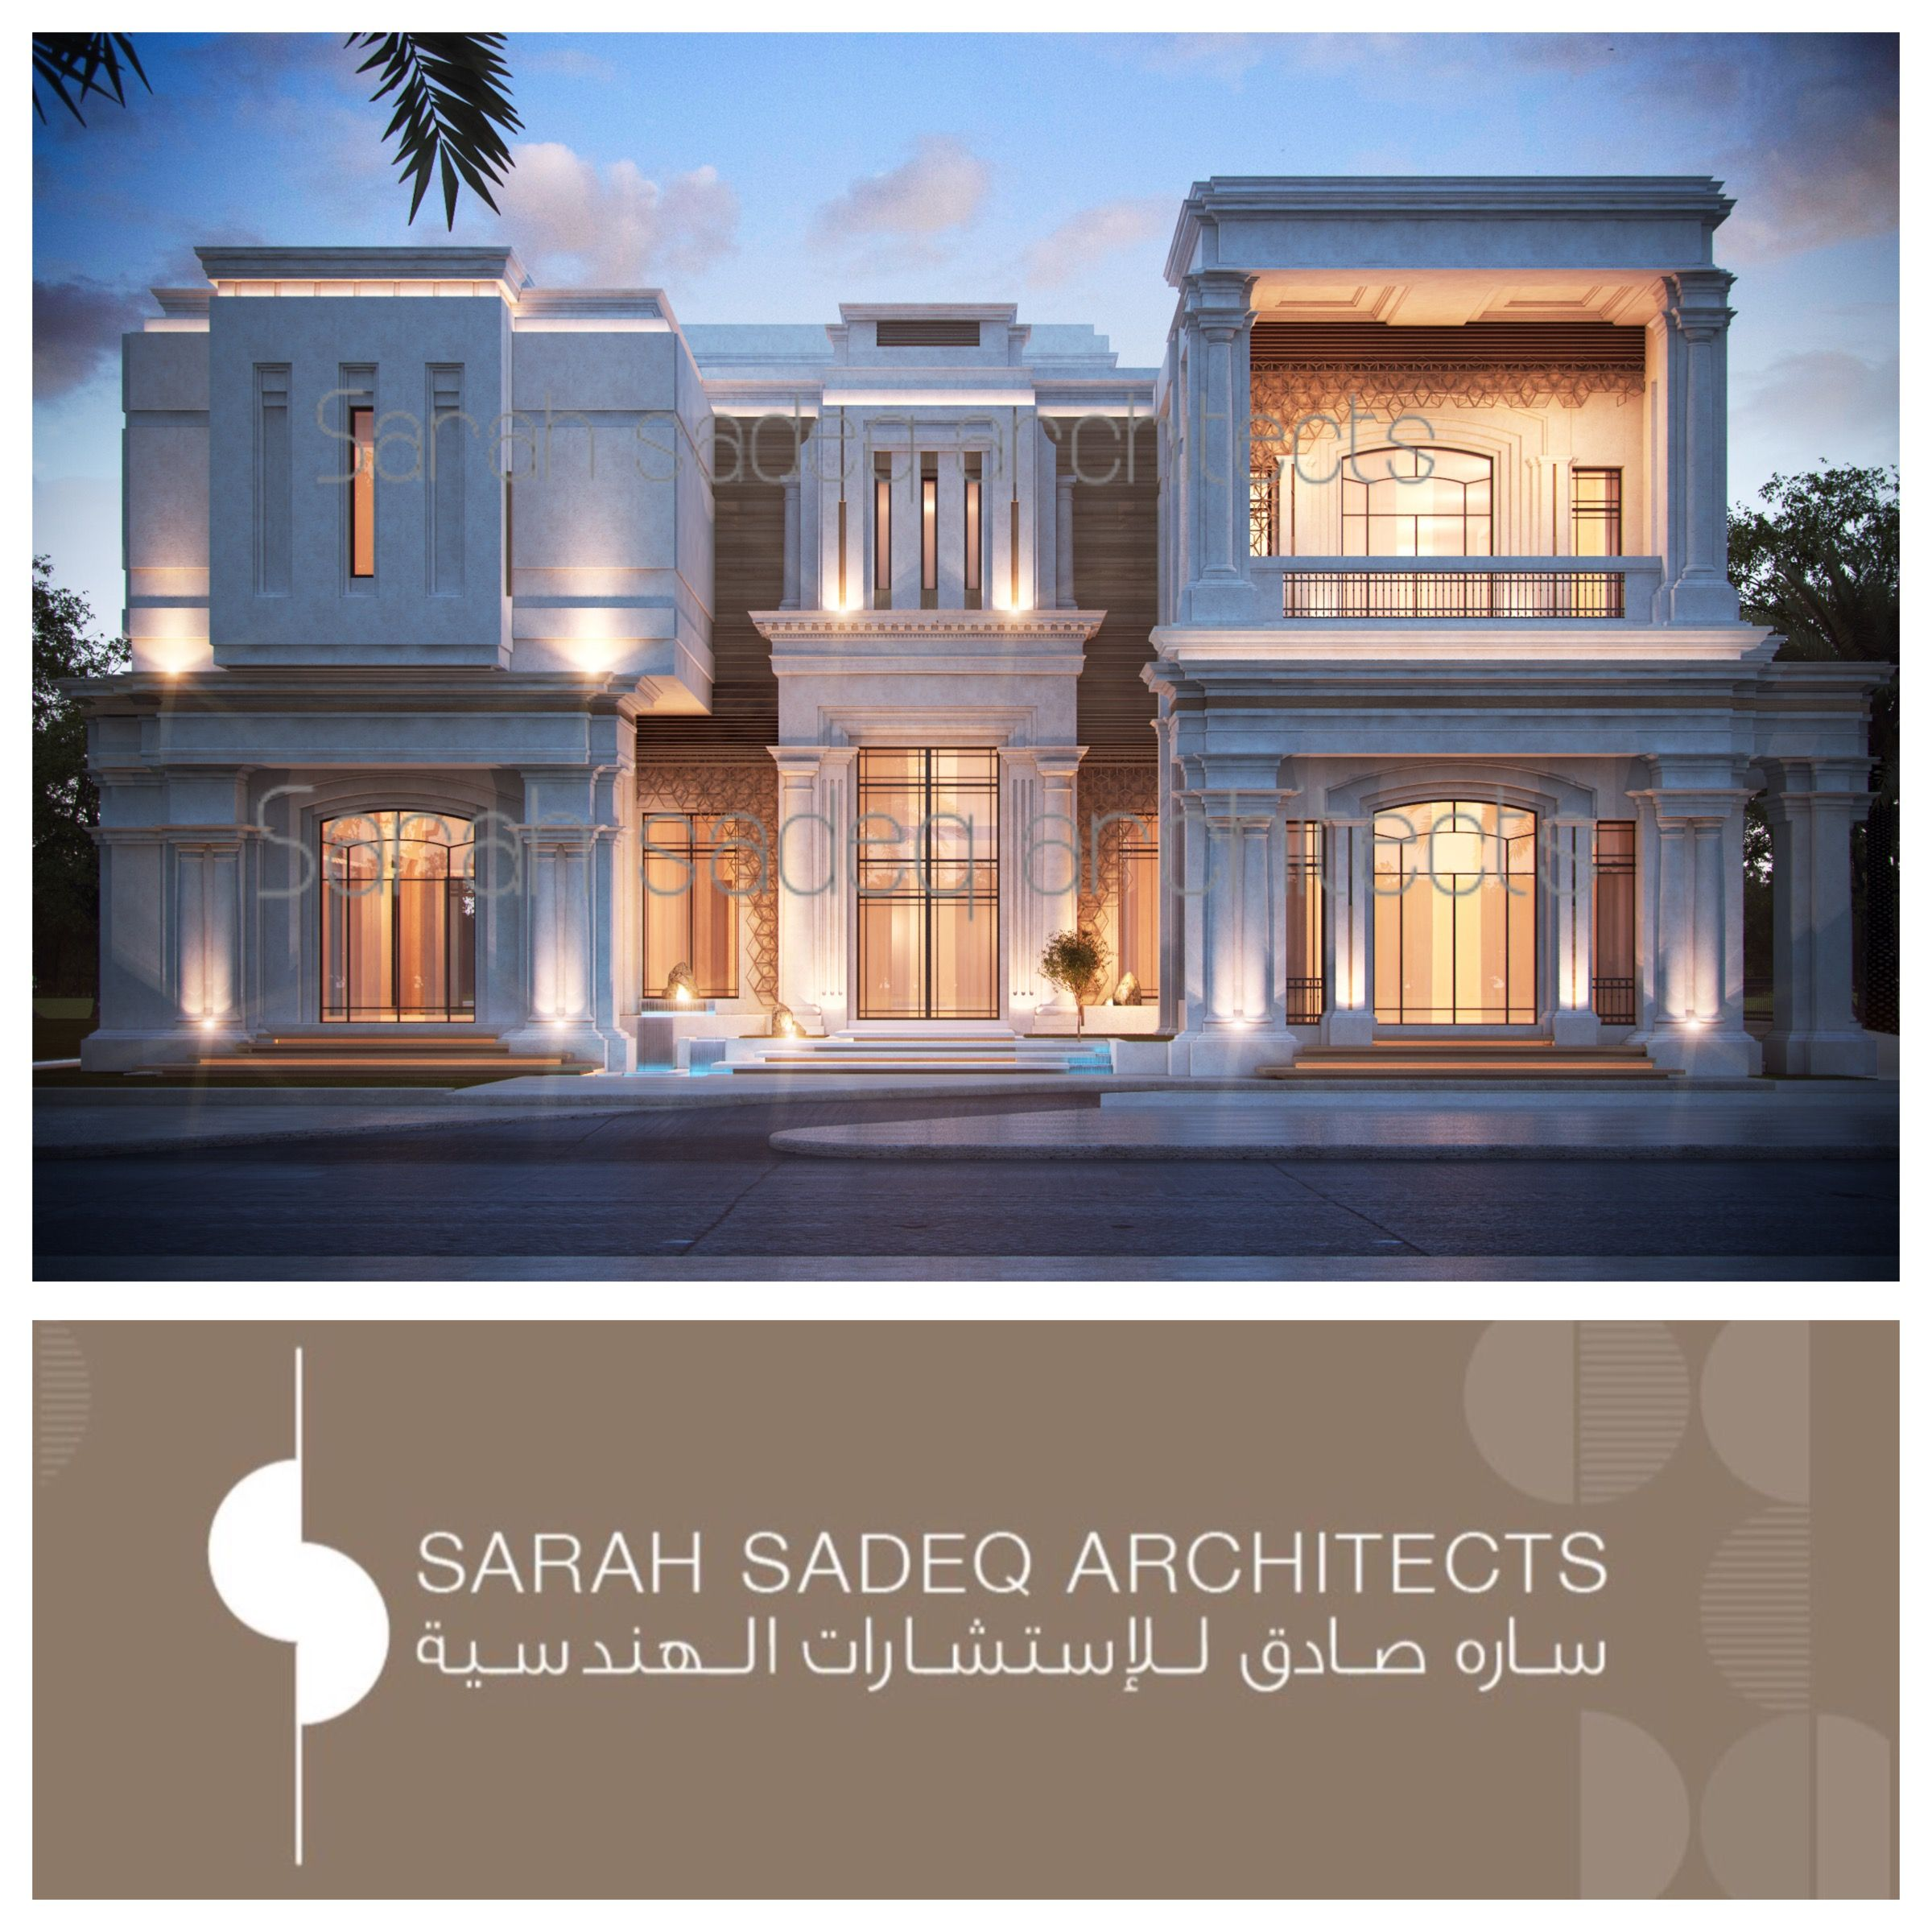 Uae by sarah sadeq architects dubai ✨ exterior houses building exterior villa design